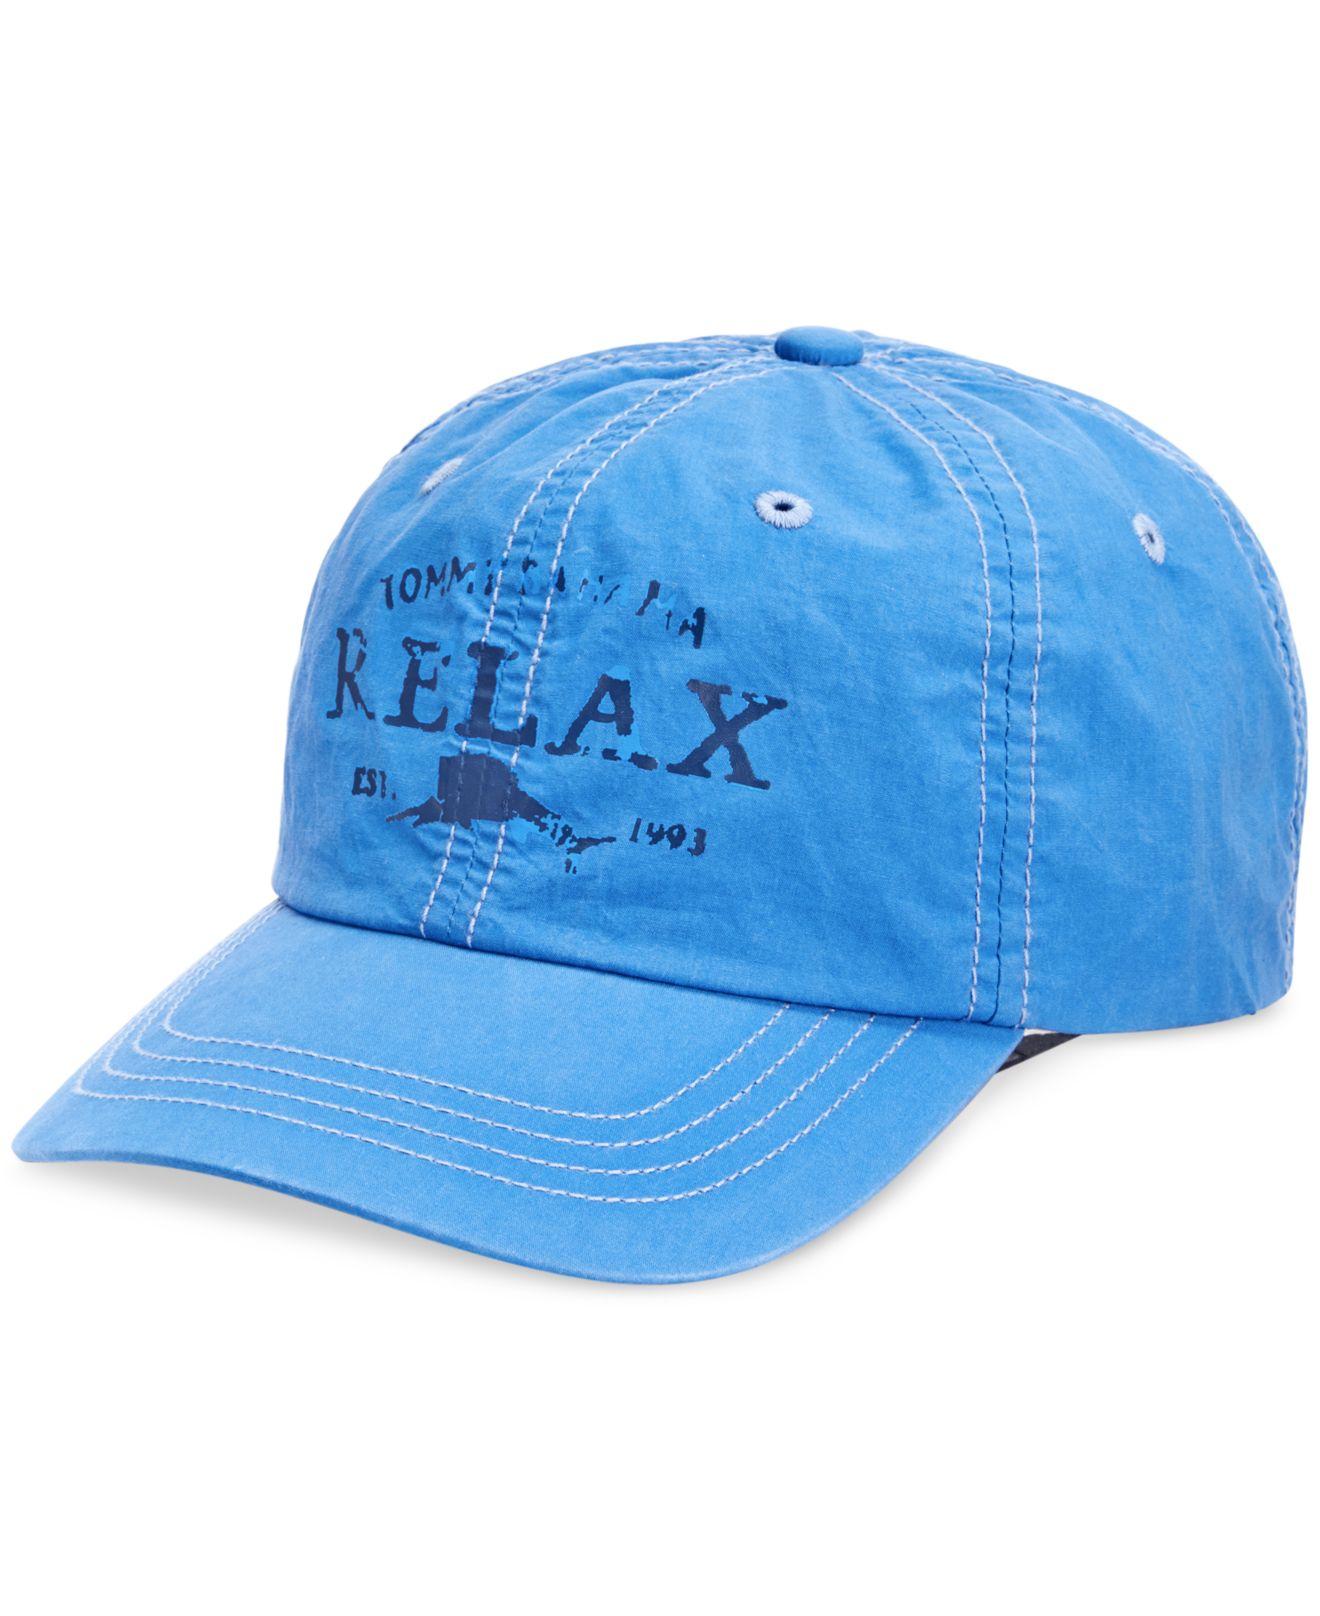 Lyst - Tommy Bahama Men s Swim Shady Cap in Blue for Men ea76880fb4b8